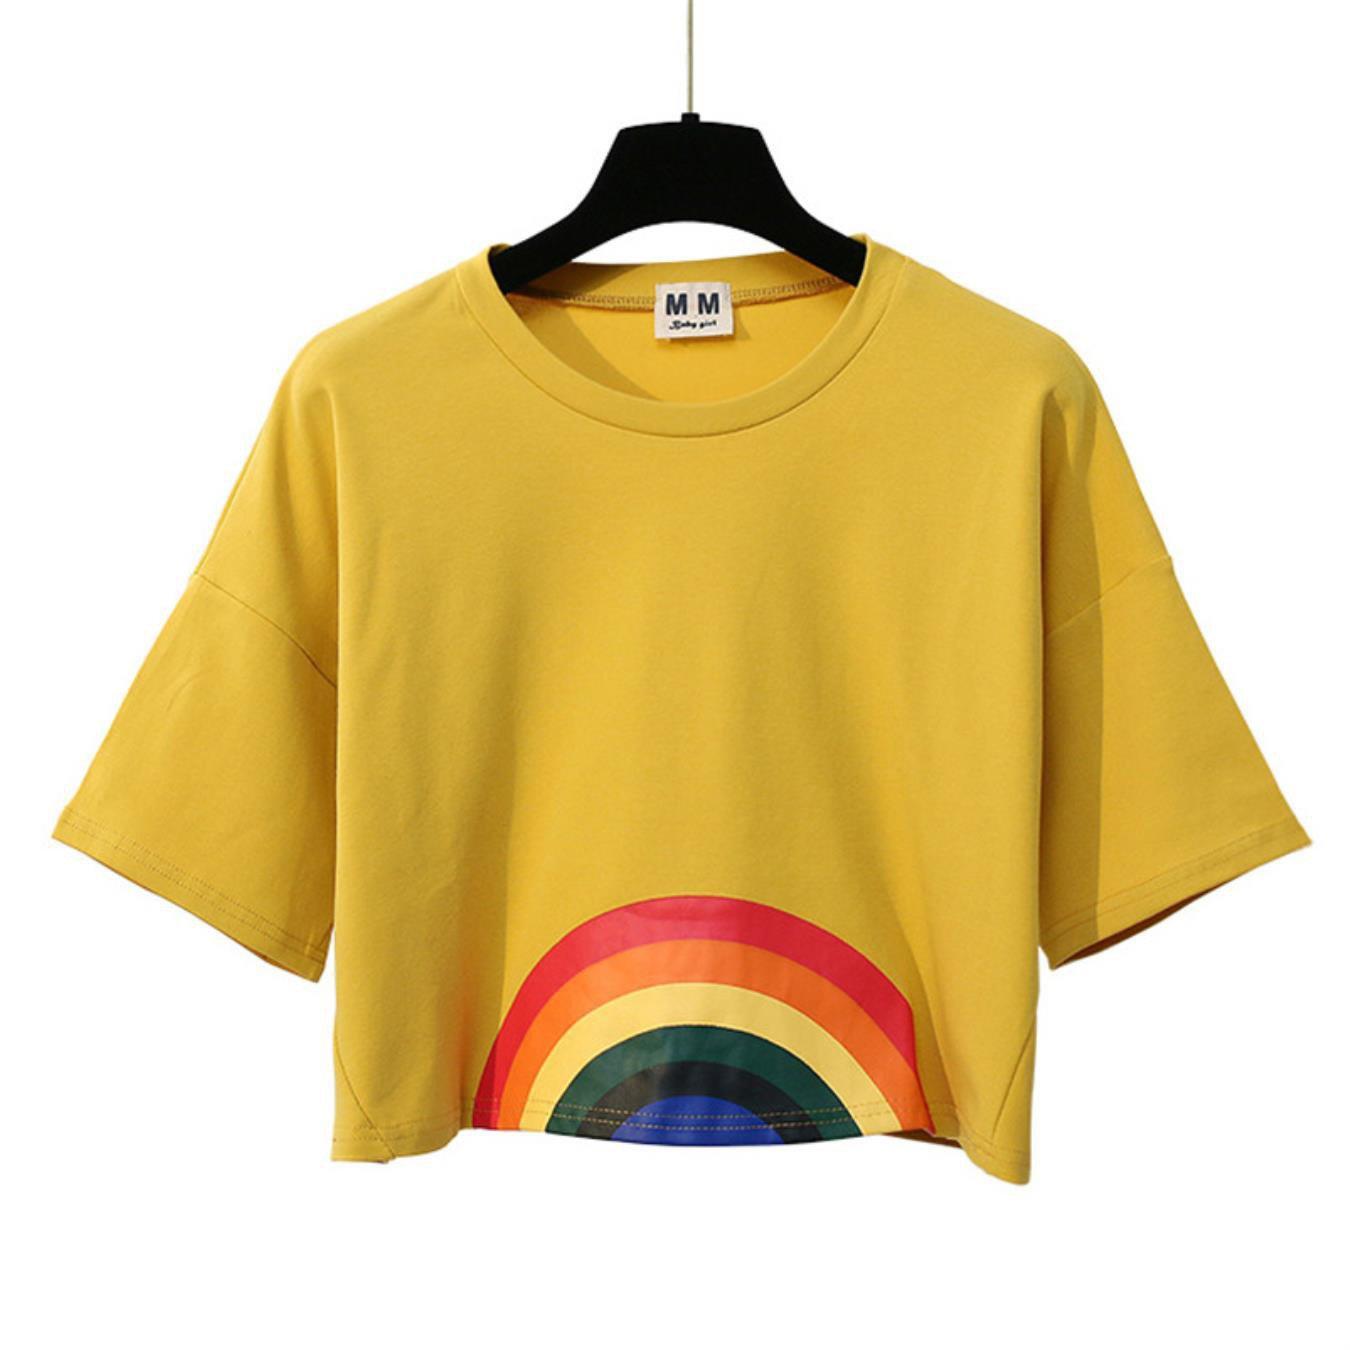 Merry Pretty Summer New Fashion Harajuku Women T-shirt Kawaii Rainbow Print Crop tops